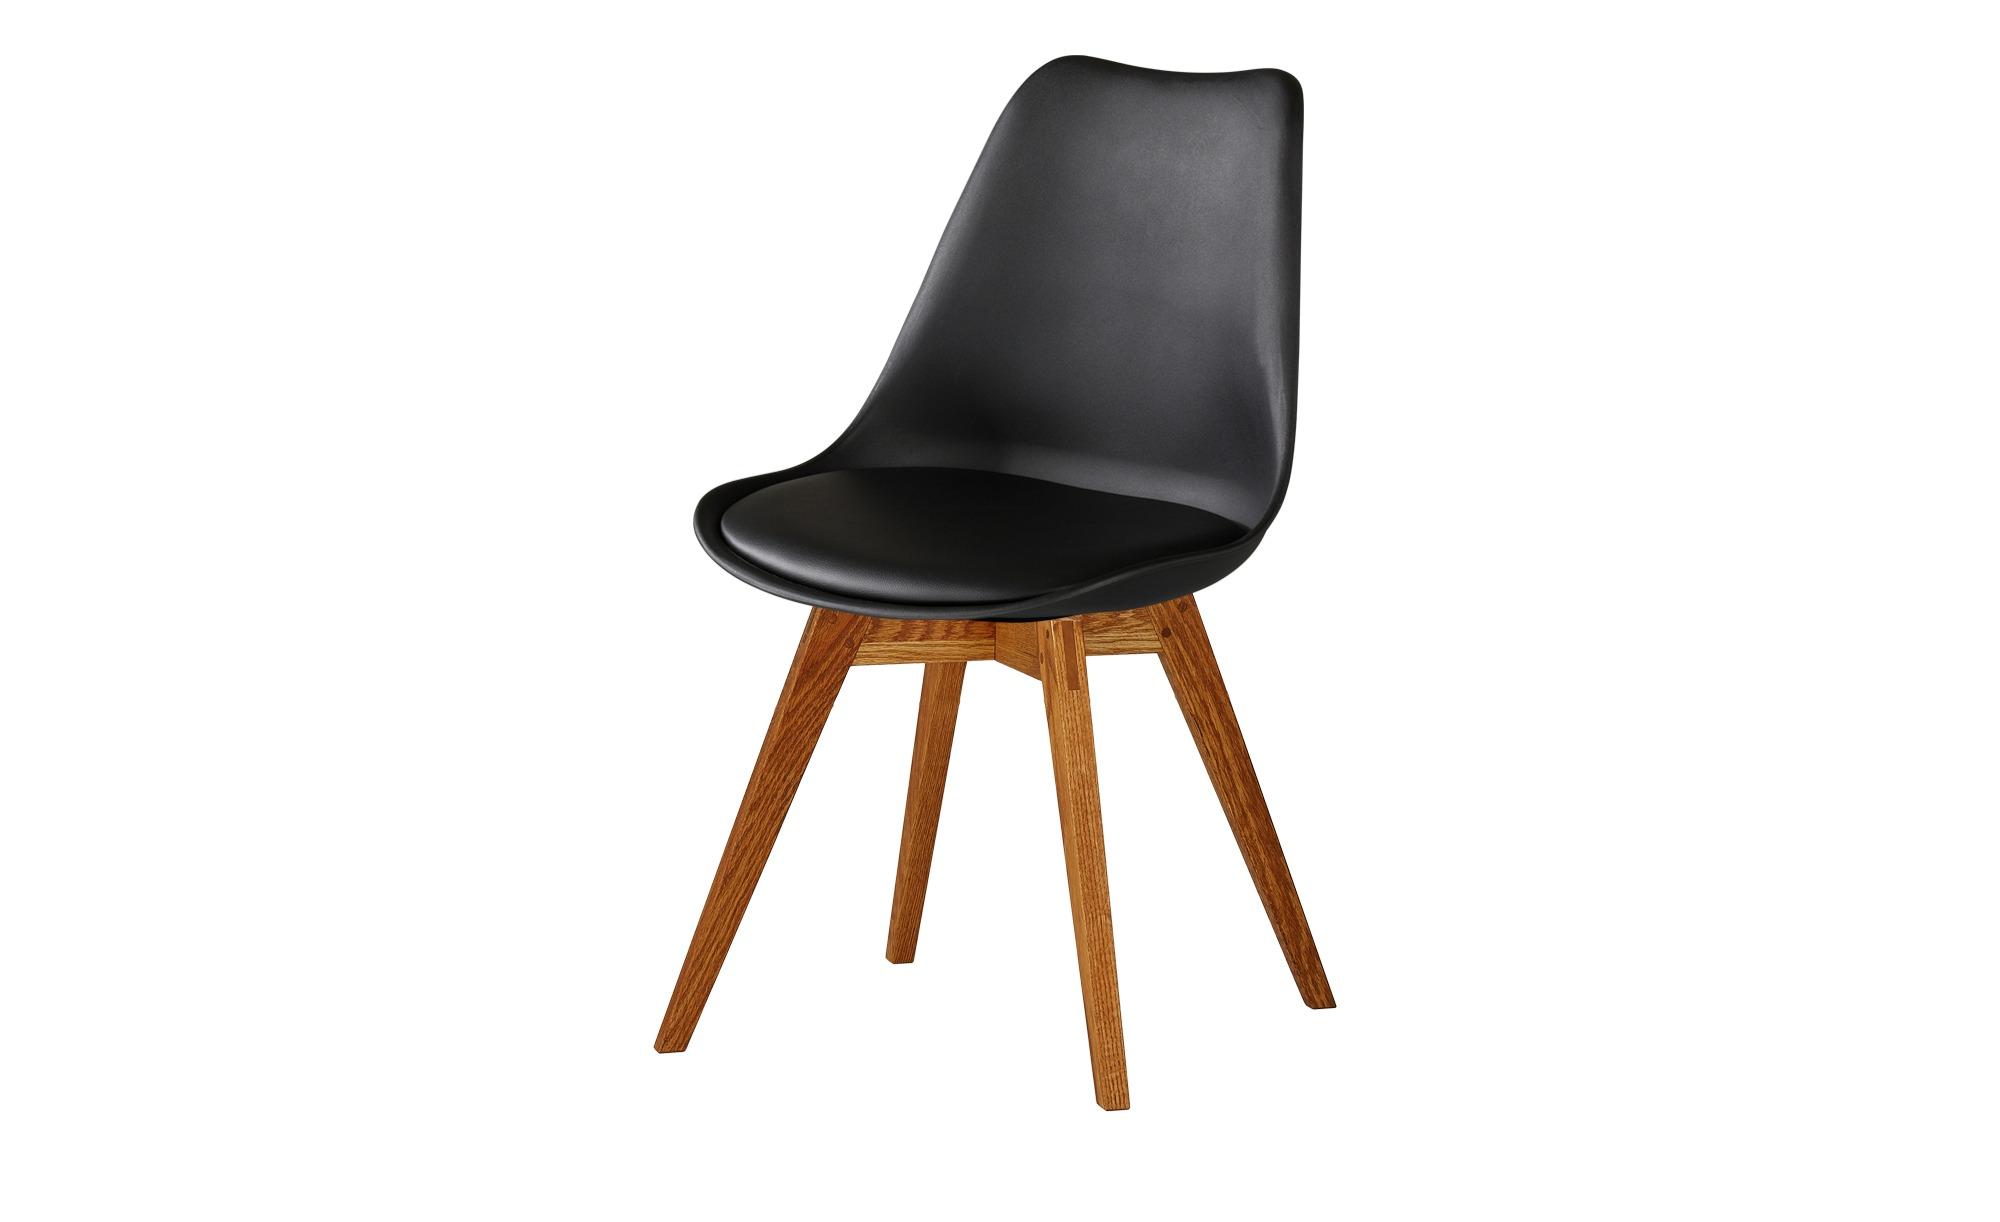 moderne esszimmerst hle mit ohne armlehne bei h ffner. Black Bedroom Furniture Sets. Home Design Ideas